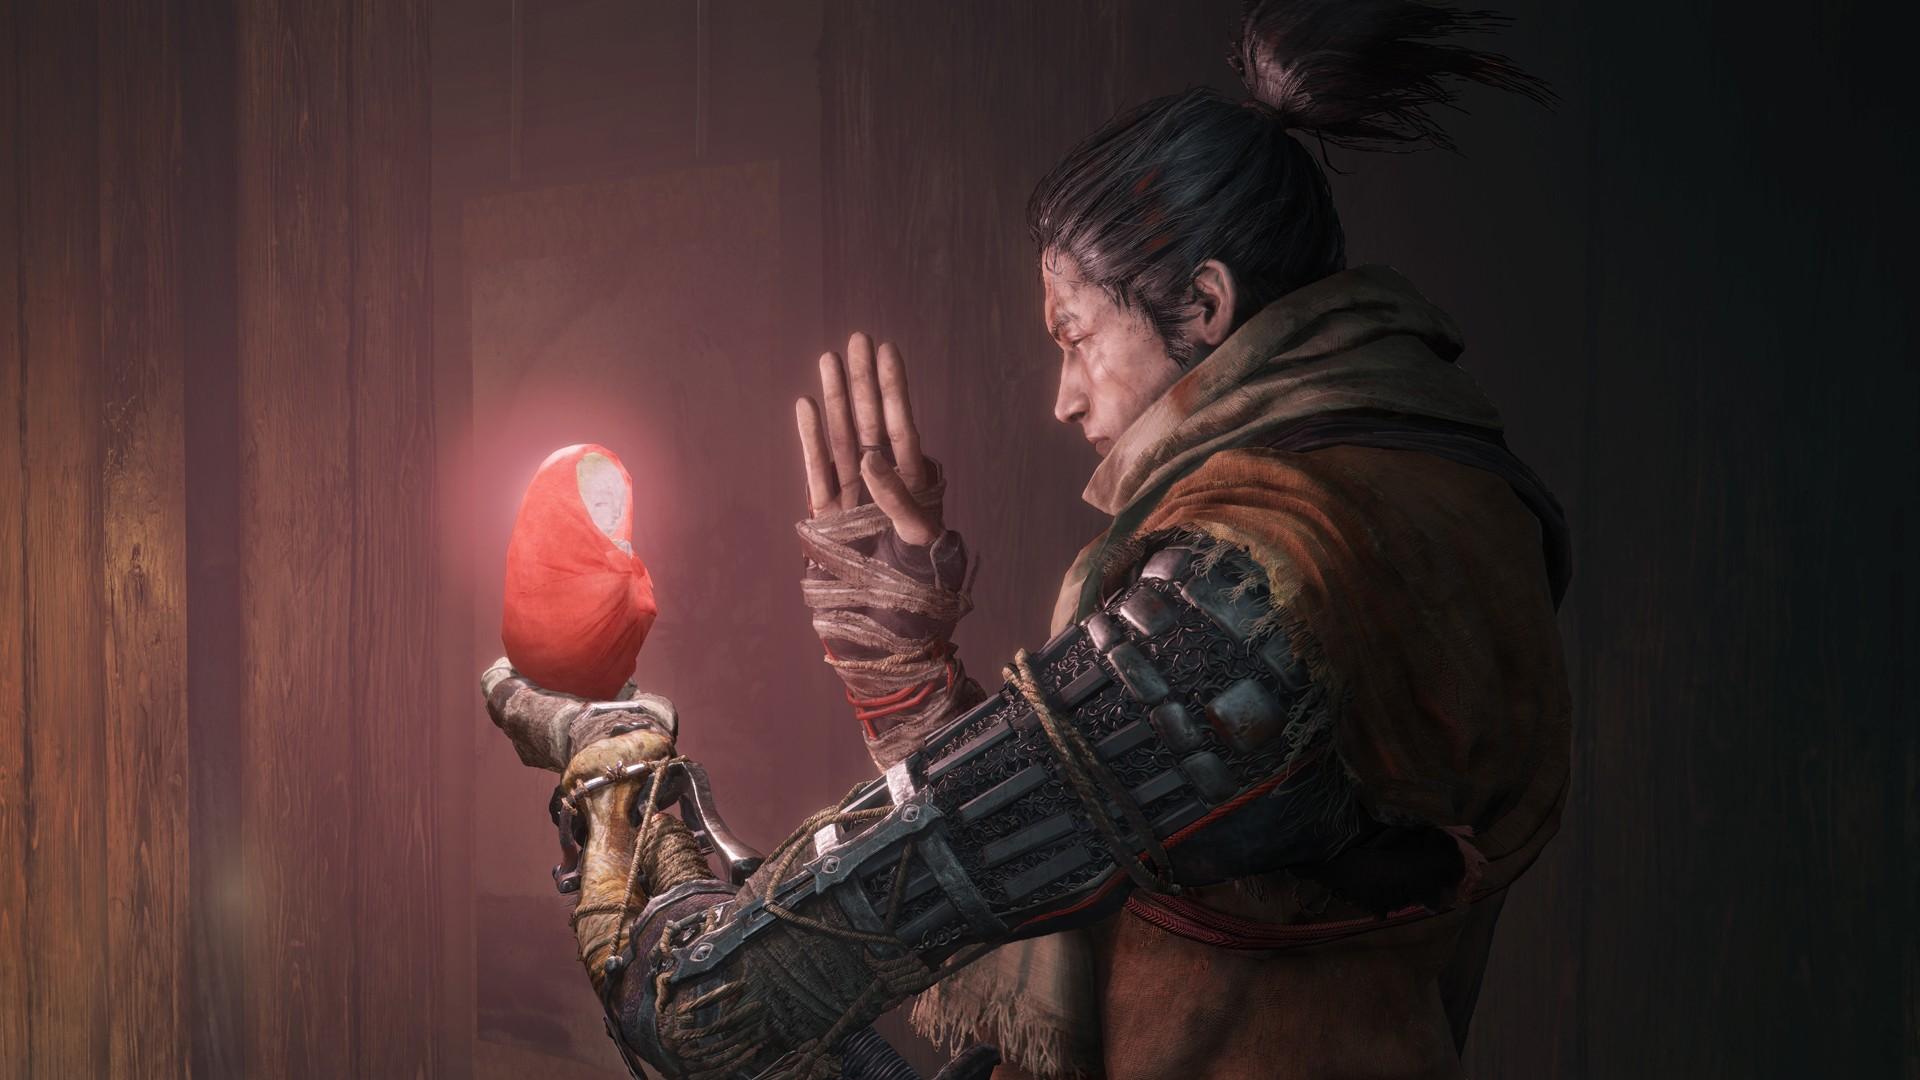 В Sekiro: Shadows Die Twice добавили оружие из Bloodborne и Dark Souls 3